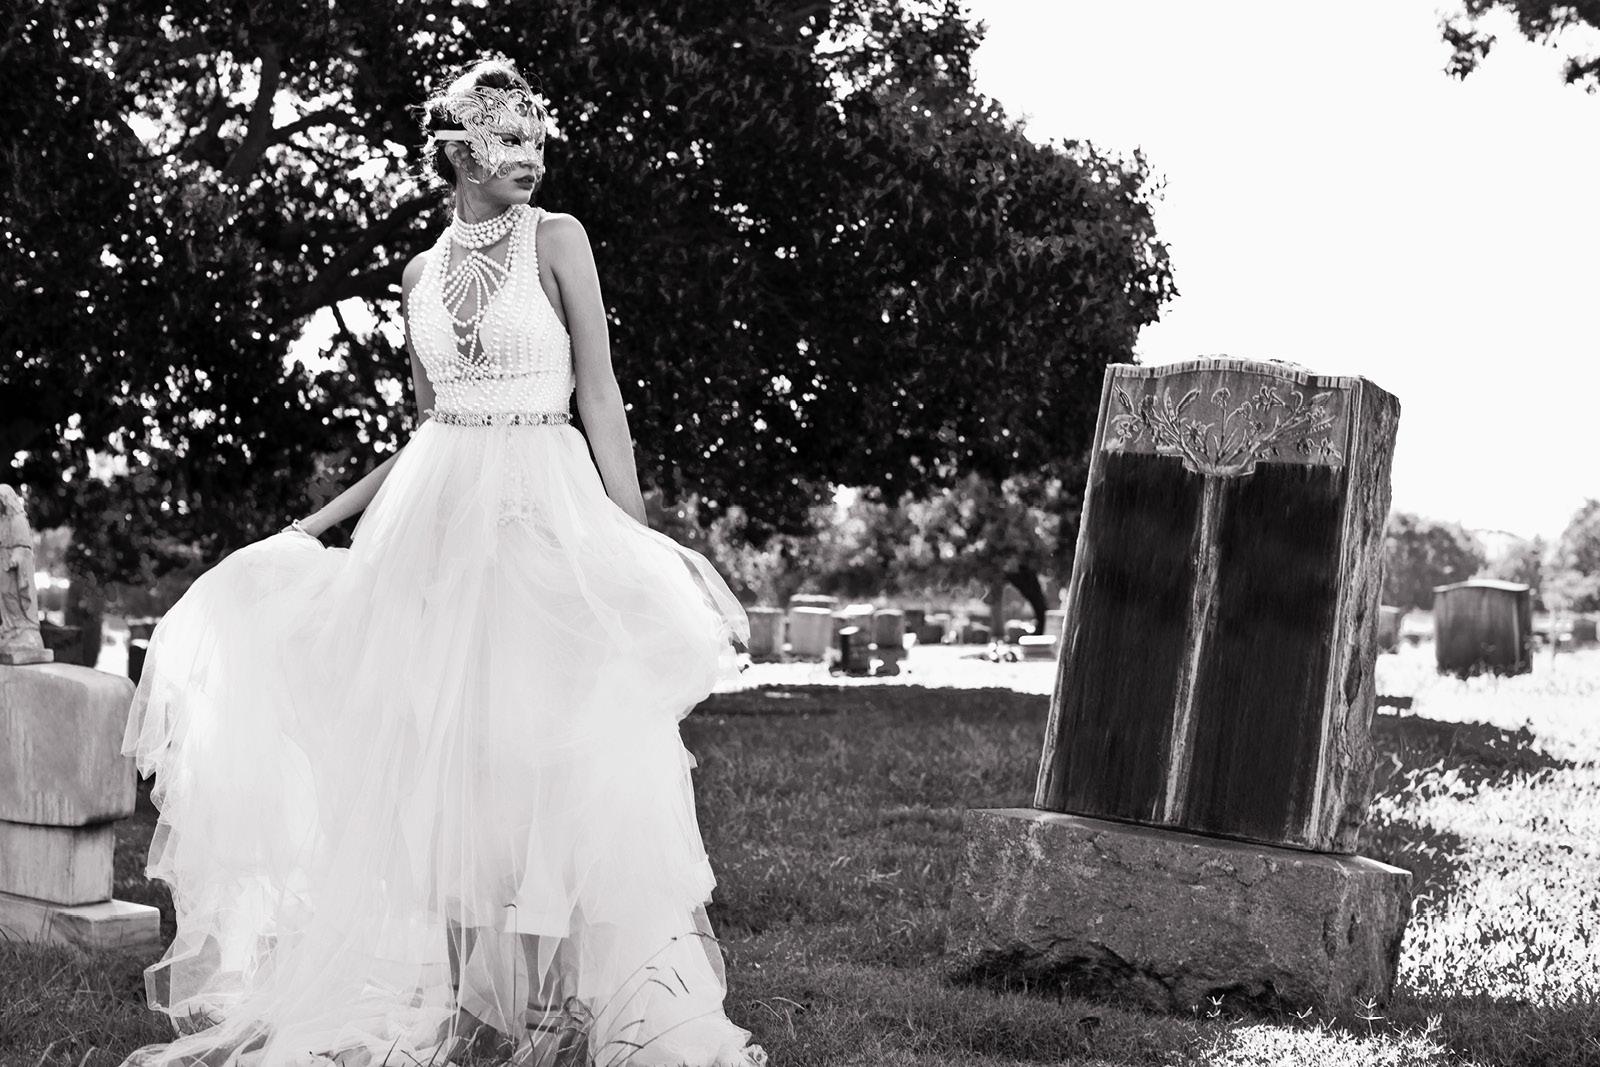 Gown GEMY  MAALOUF / Skirt MAC DUGGAL / Mask EKATERINA KUKHAREVA / Bracelette CHARLES ALBERT / Shoes ALEPEL